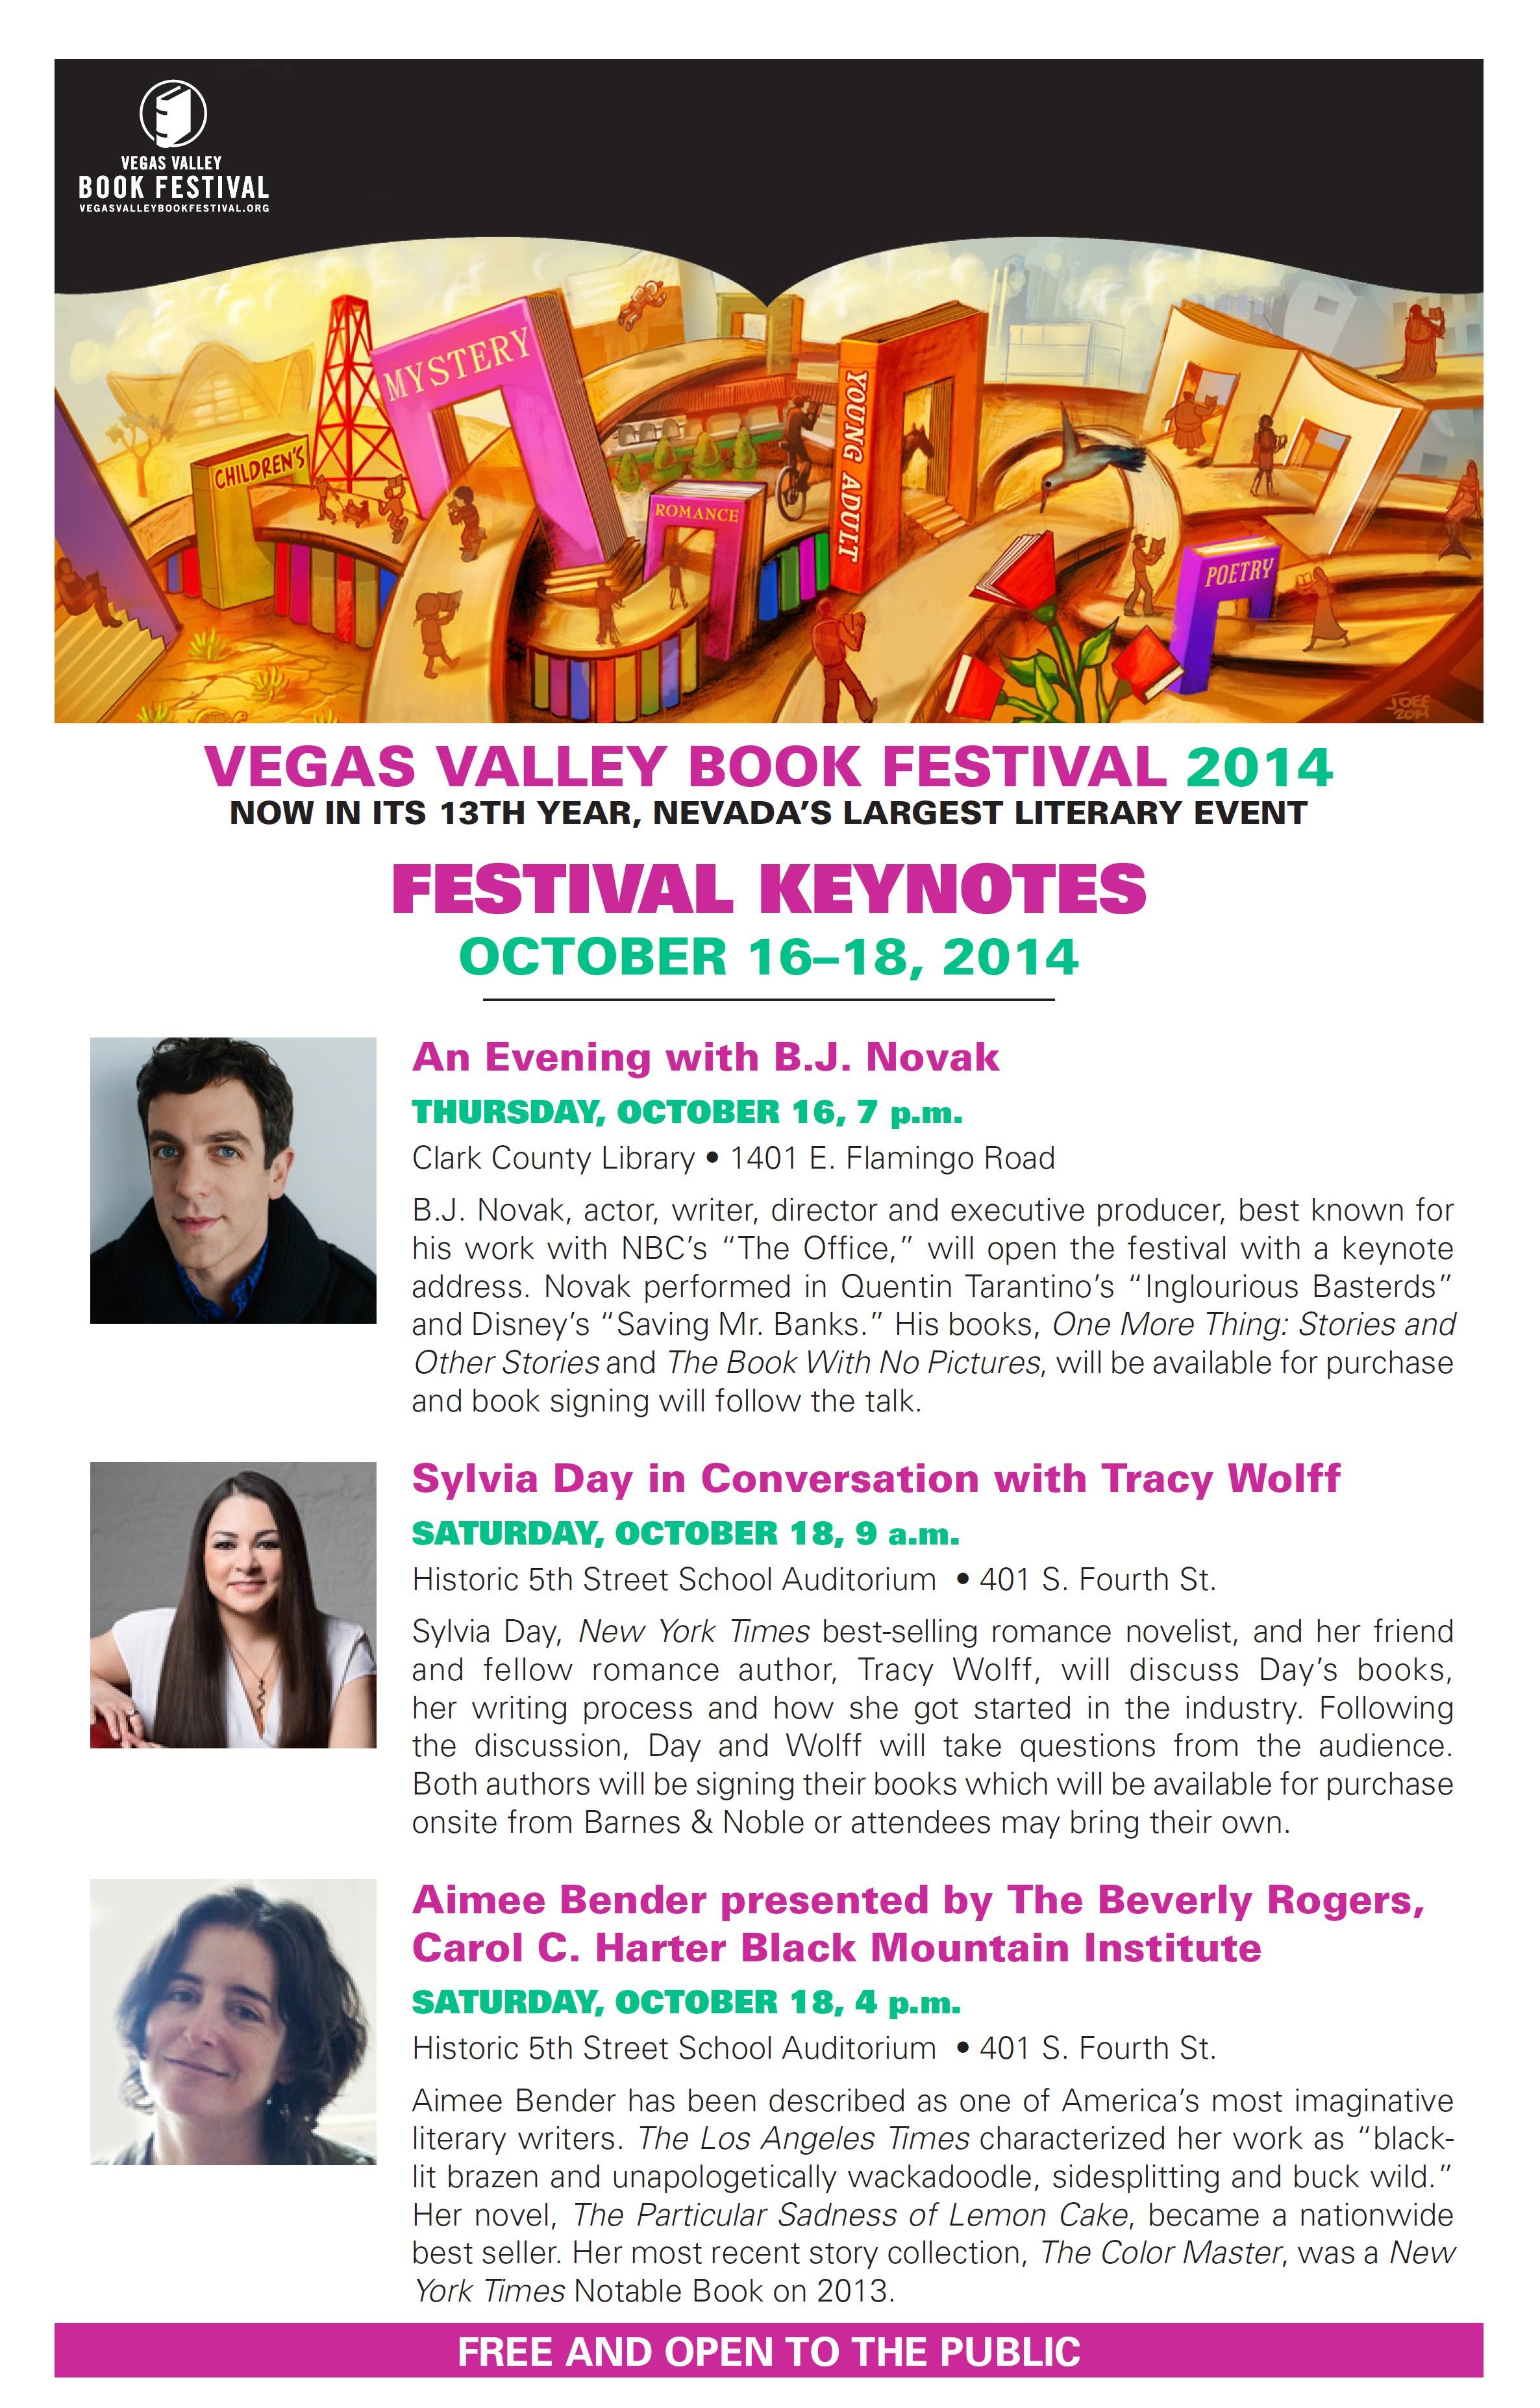 VEGAS VALLEY BOOK FESTIVAL 2014